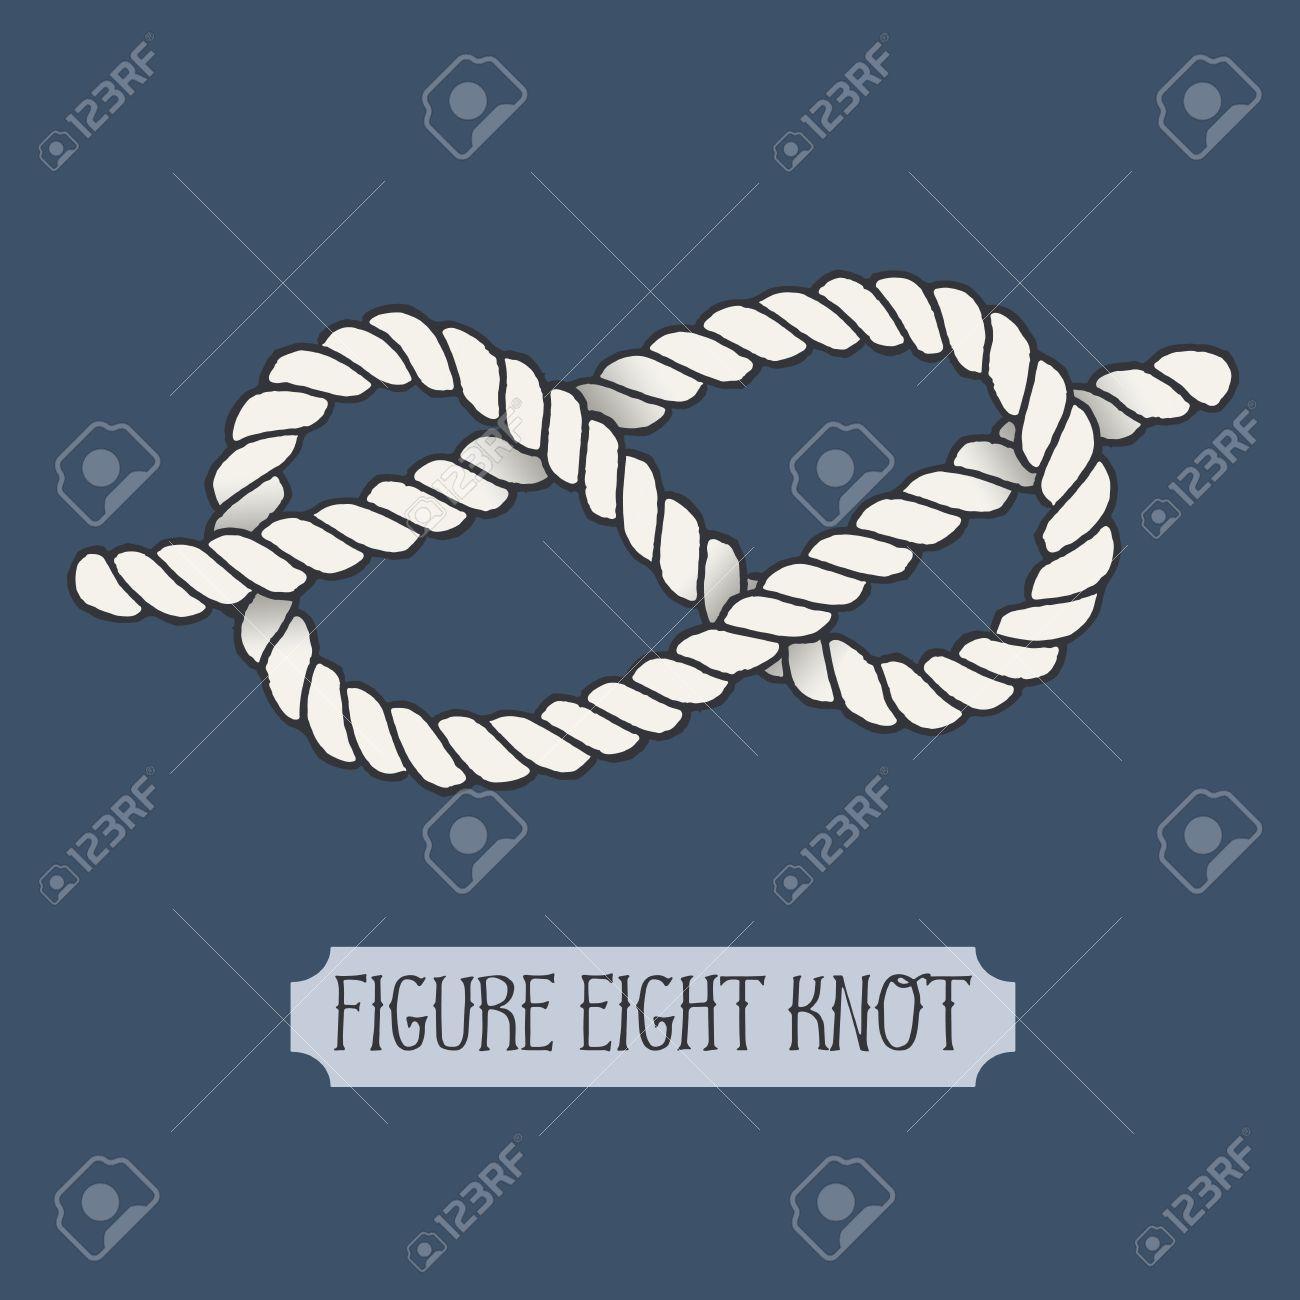 55dd019c8fca7 Single illustration of nautical knot. Figure Eight Knot. Sailor..